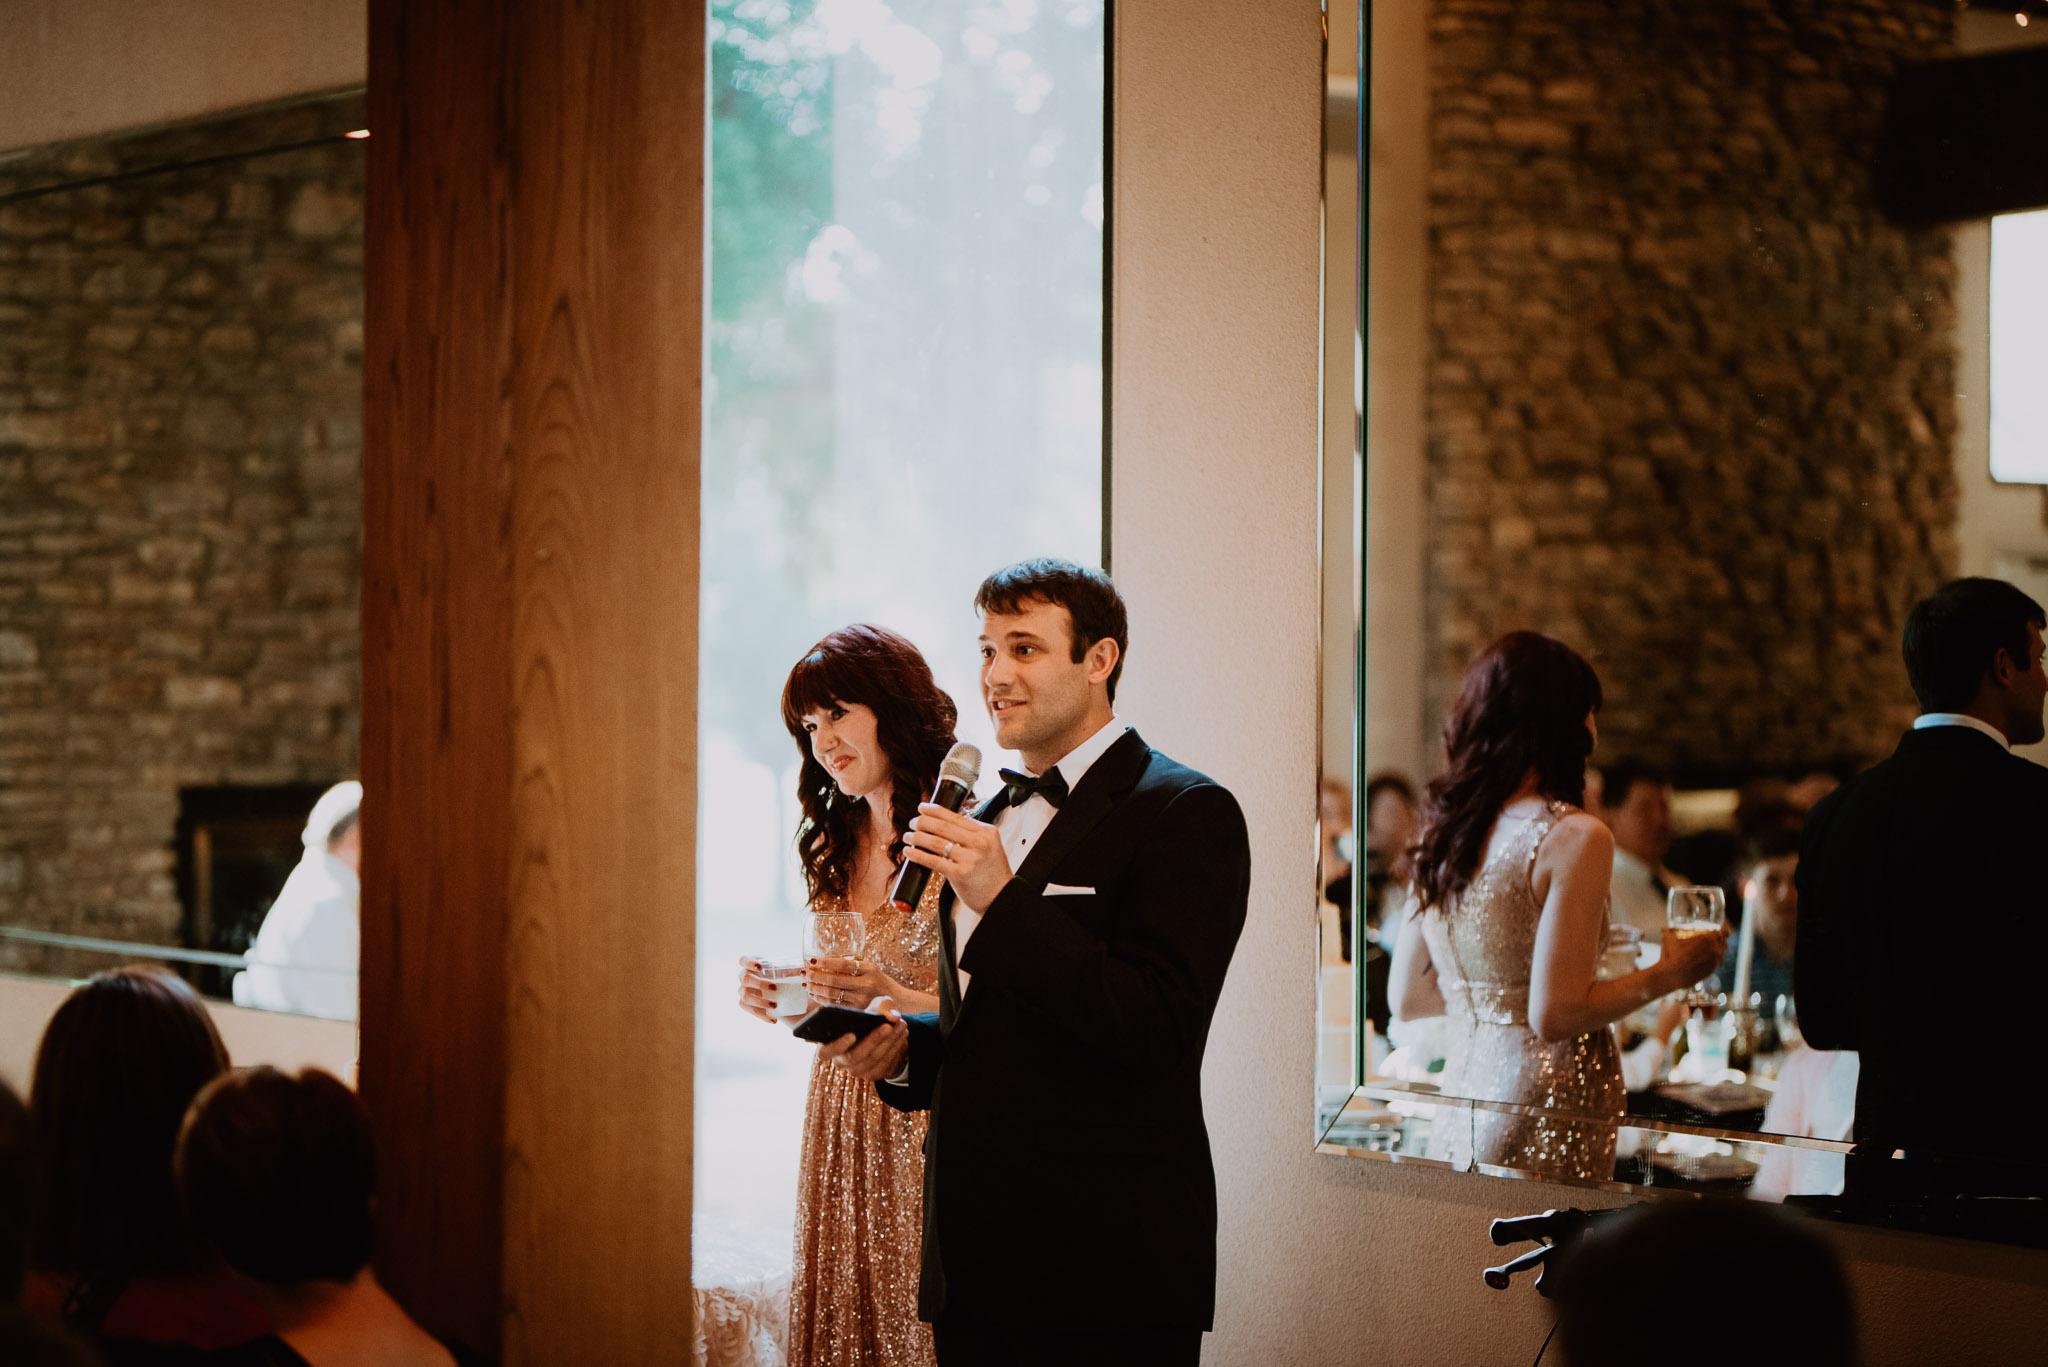 Bentwood-country-club-wedding-shea-tyson-0020.jpg